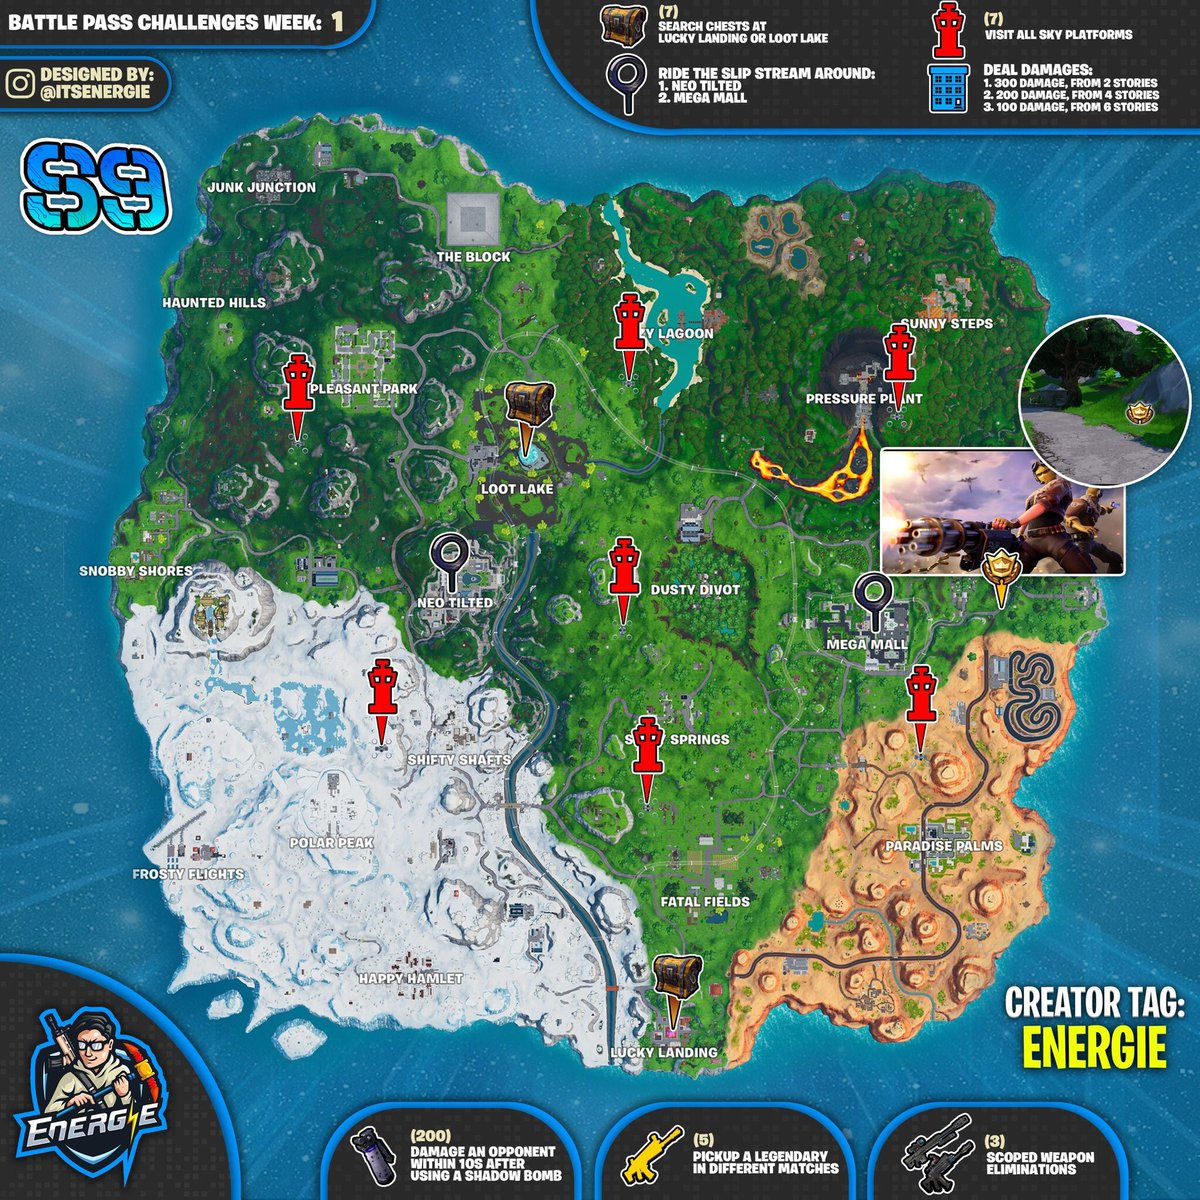 Fortnite Cheat Sheet Map For Season 9, Week 1 Challenges | Fortnite